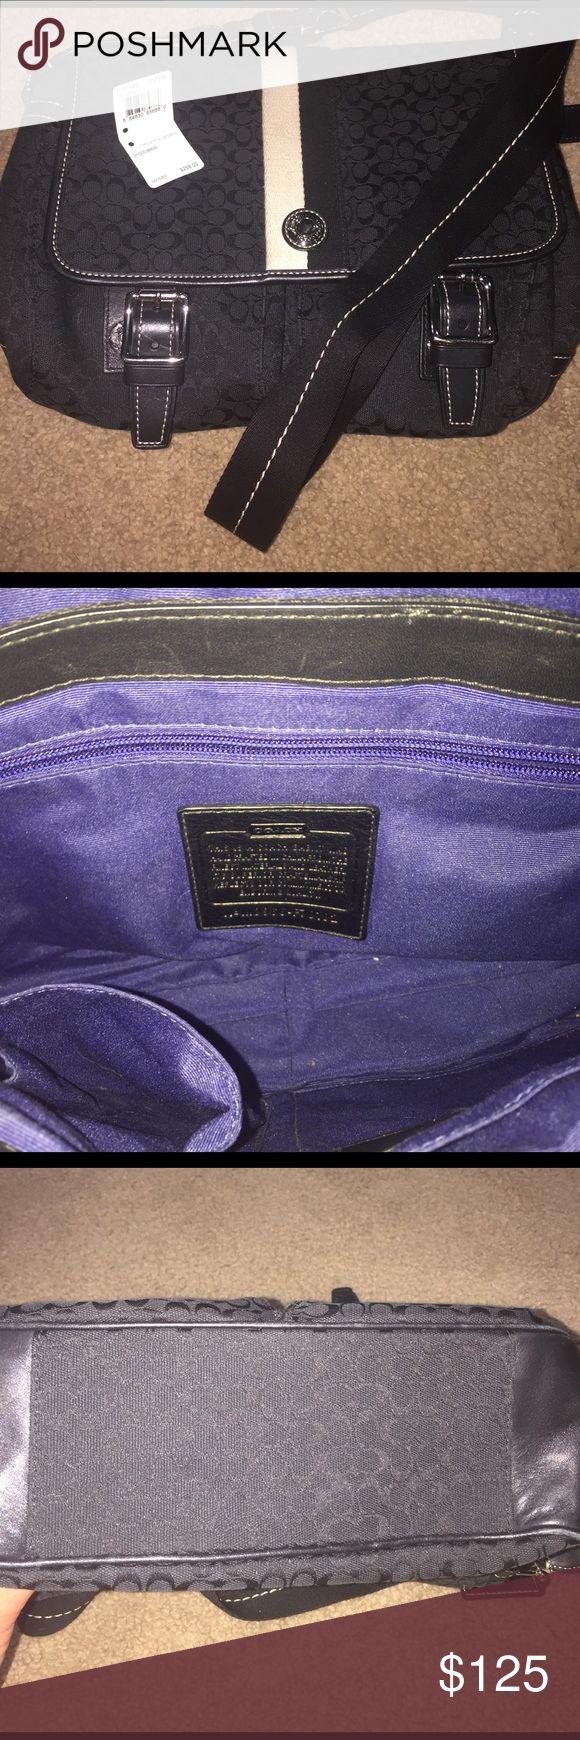 ⭐️ Coach Messenger bag Like new Coach Messenger Bag. Coach Bags Crossbody Bags